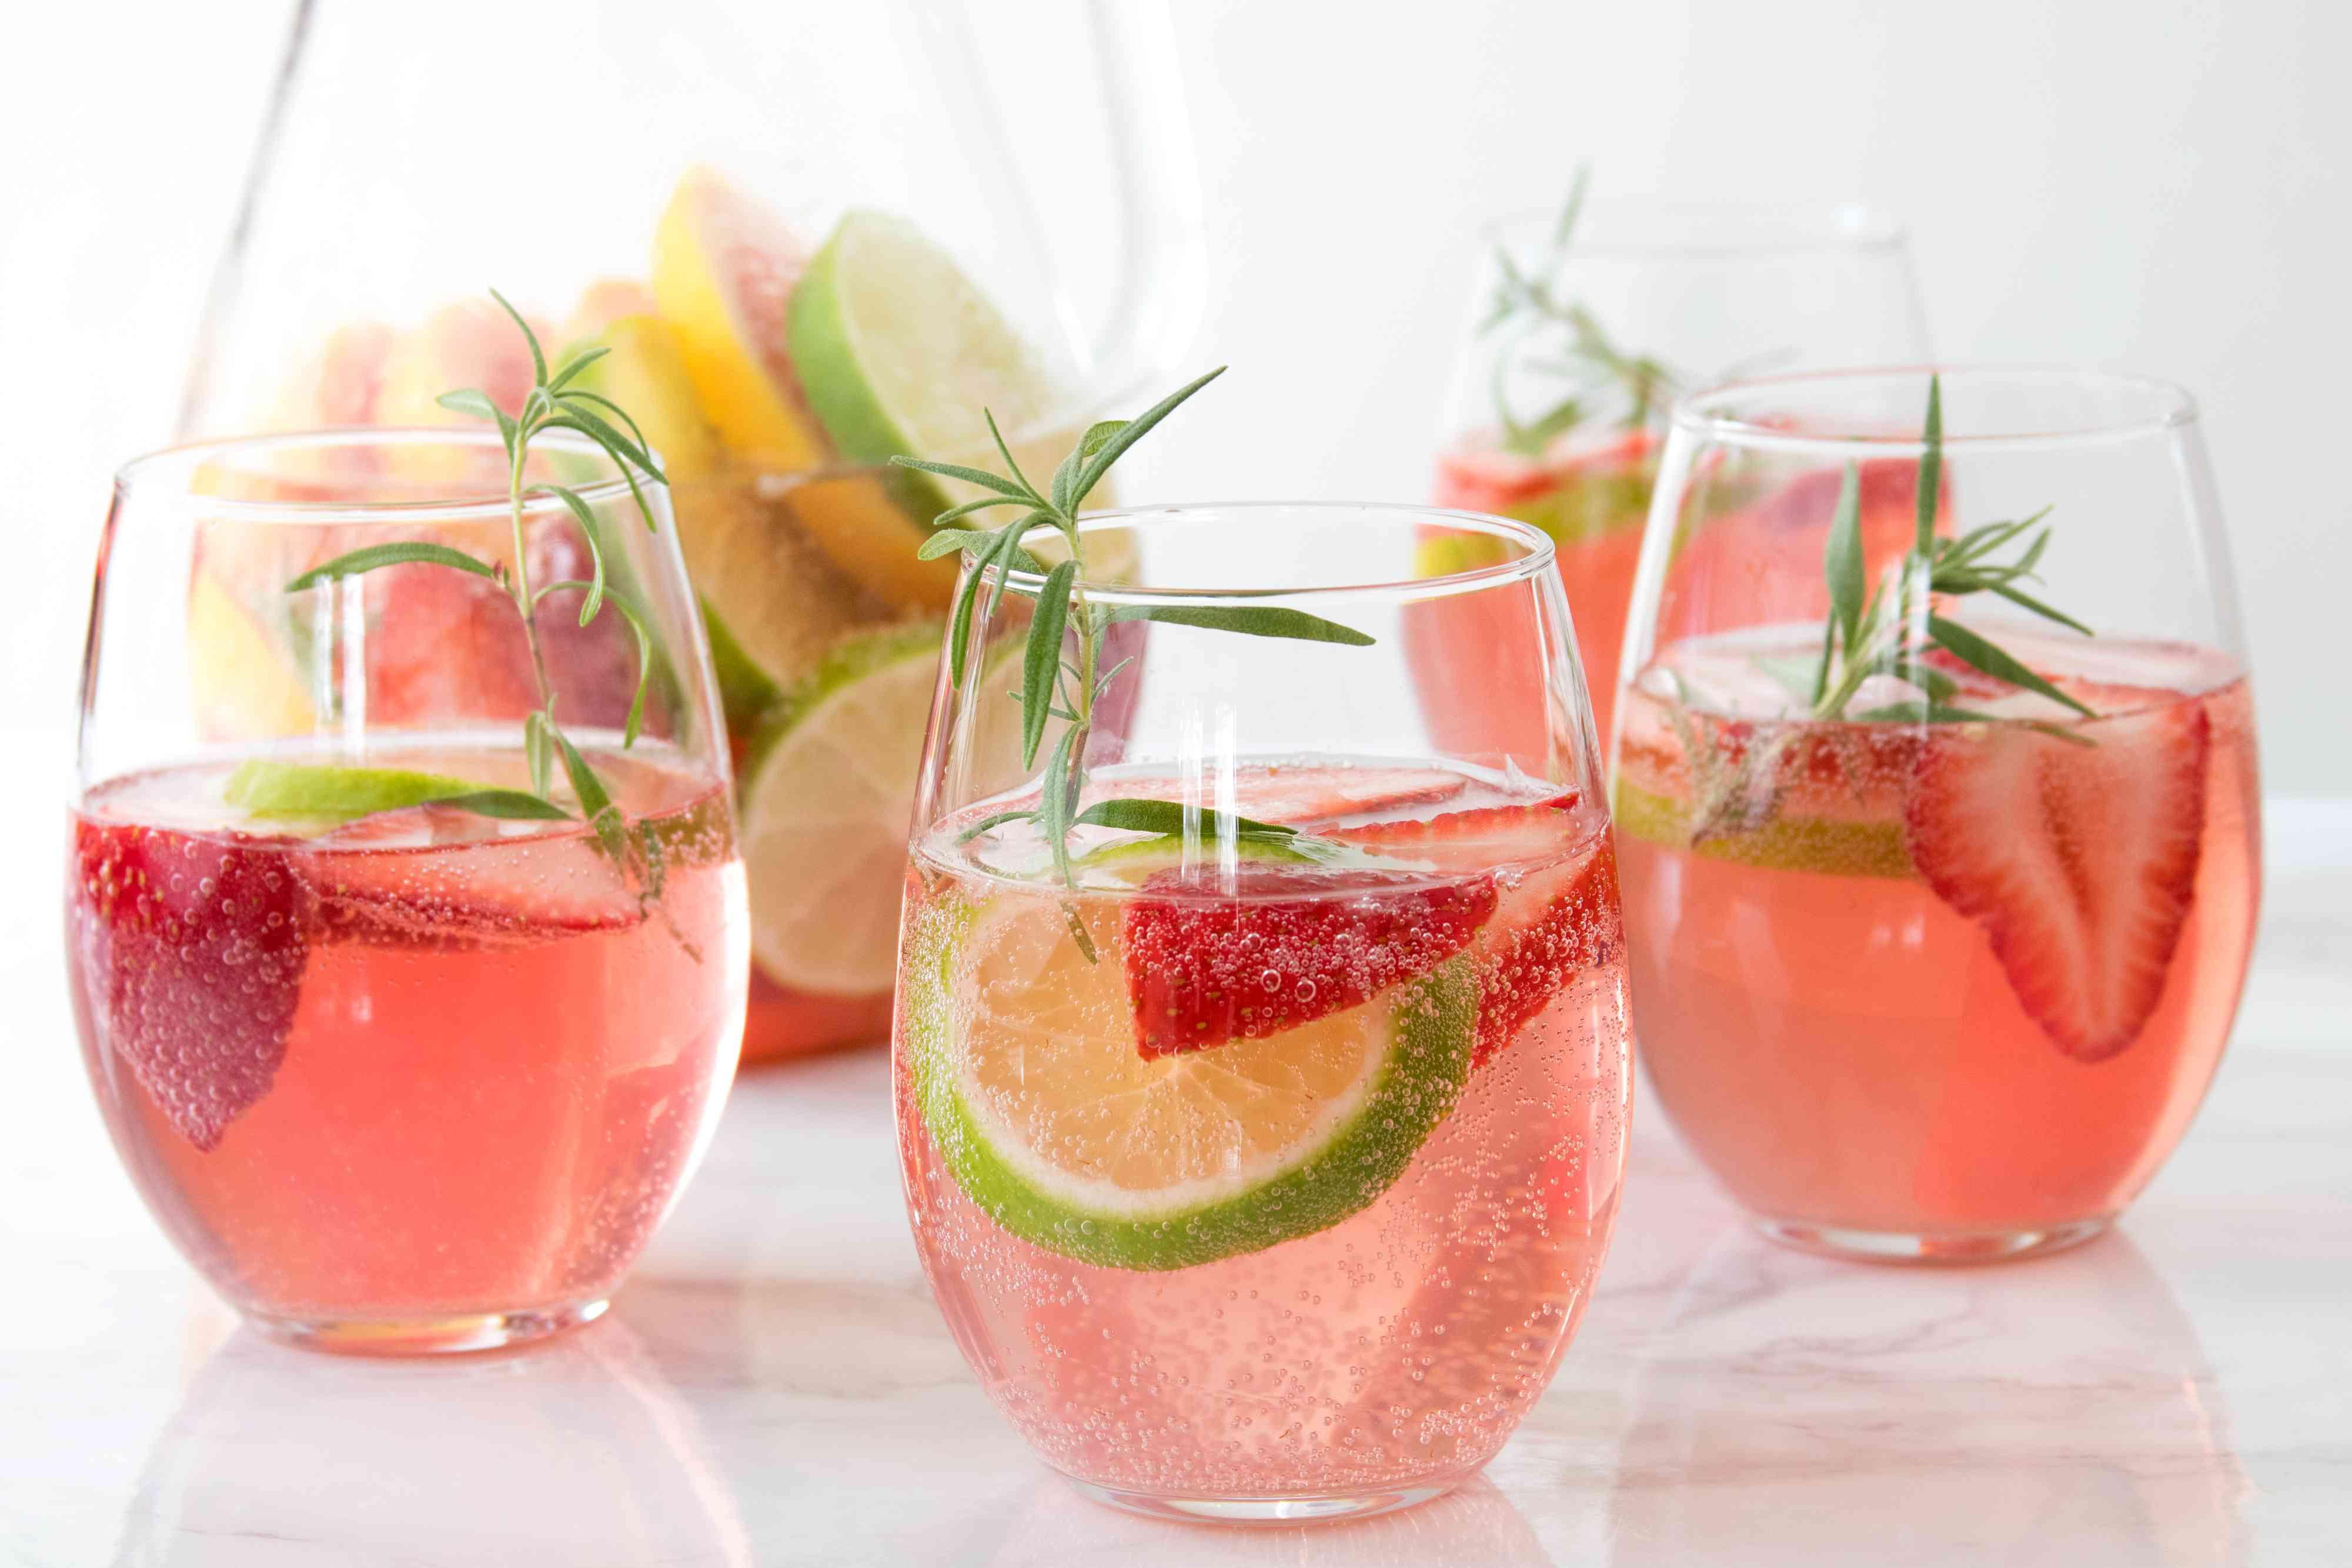 Low-Sugar Citrus, Strawberry, and Rosemary Sangria